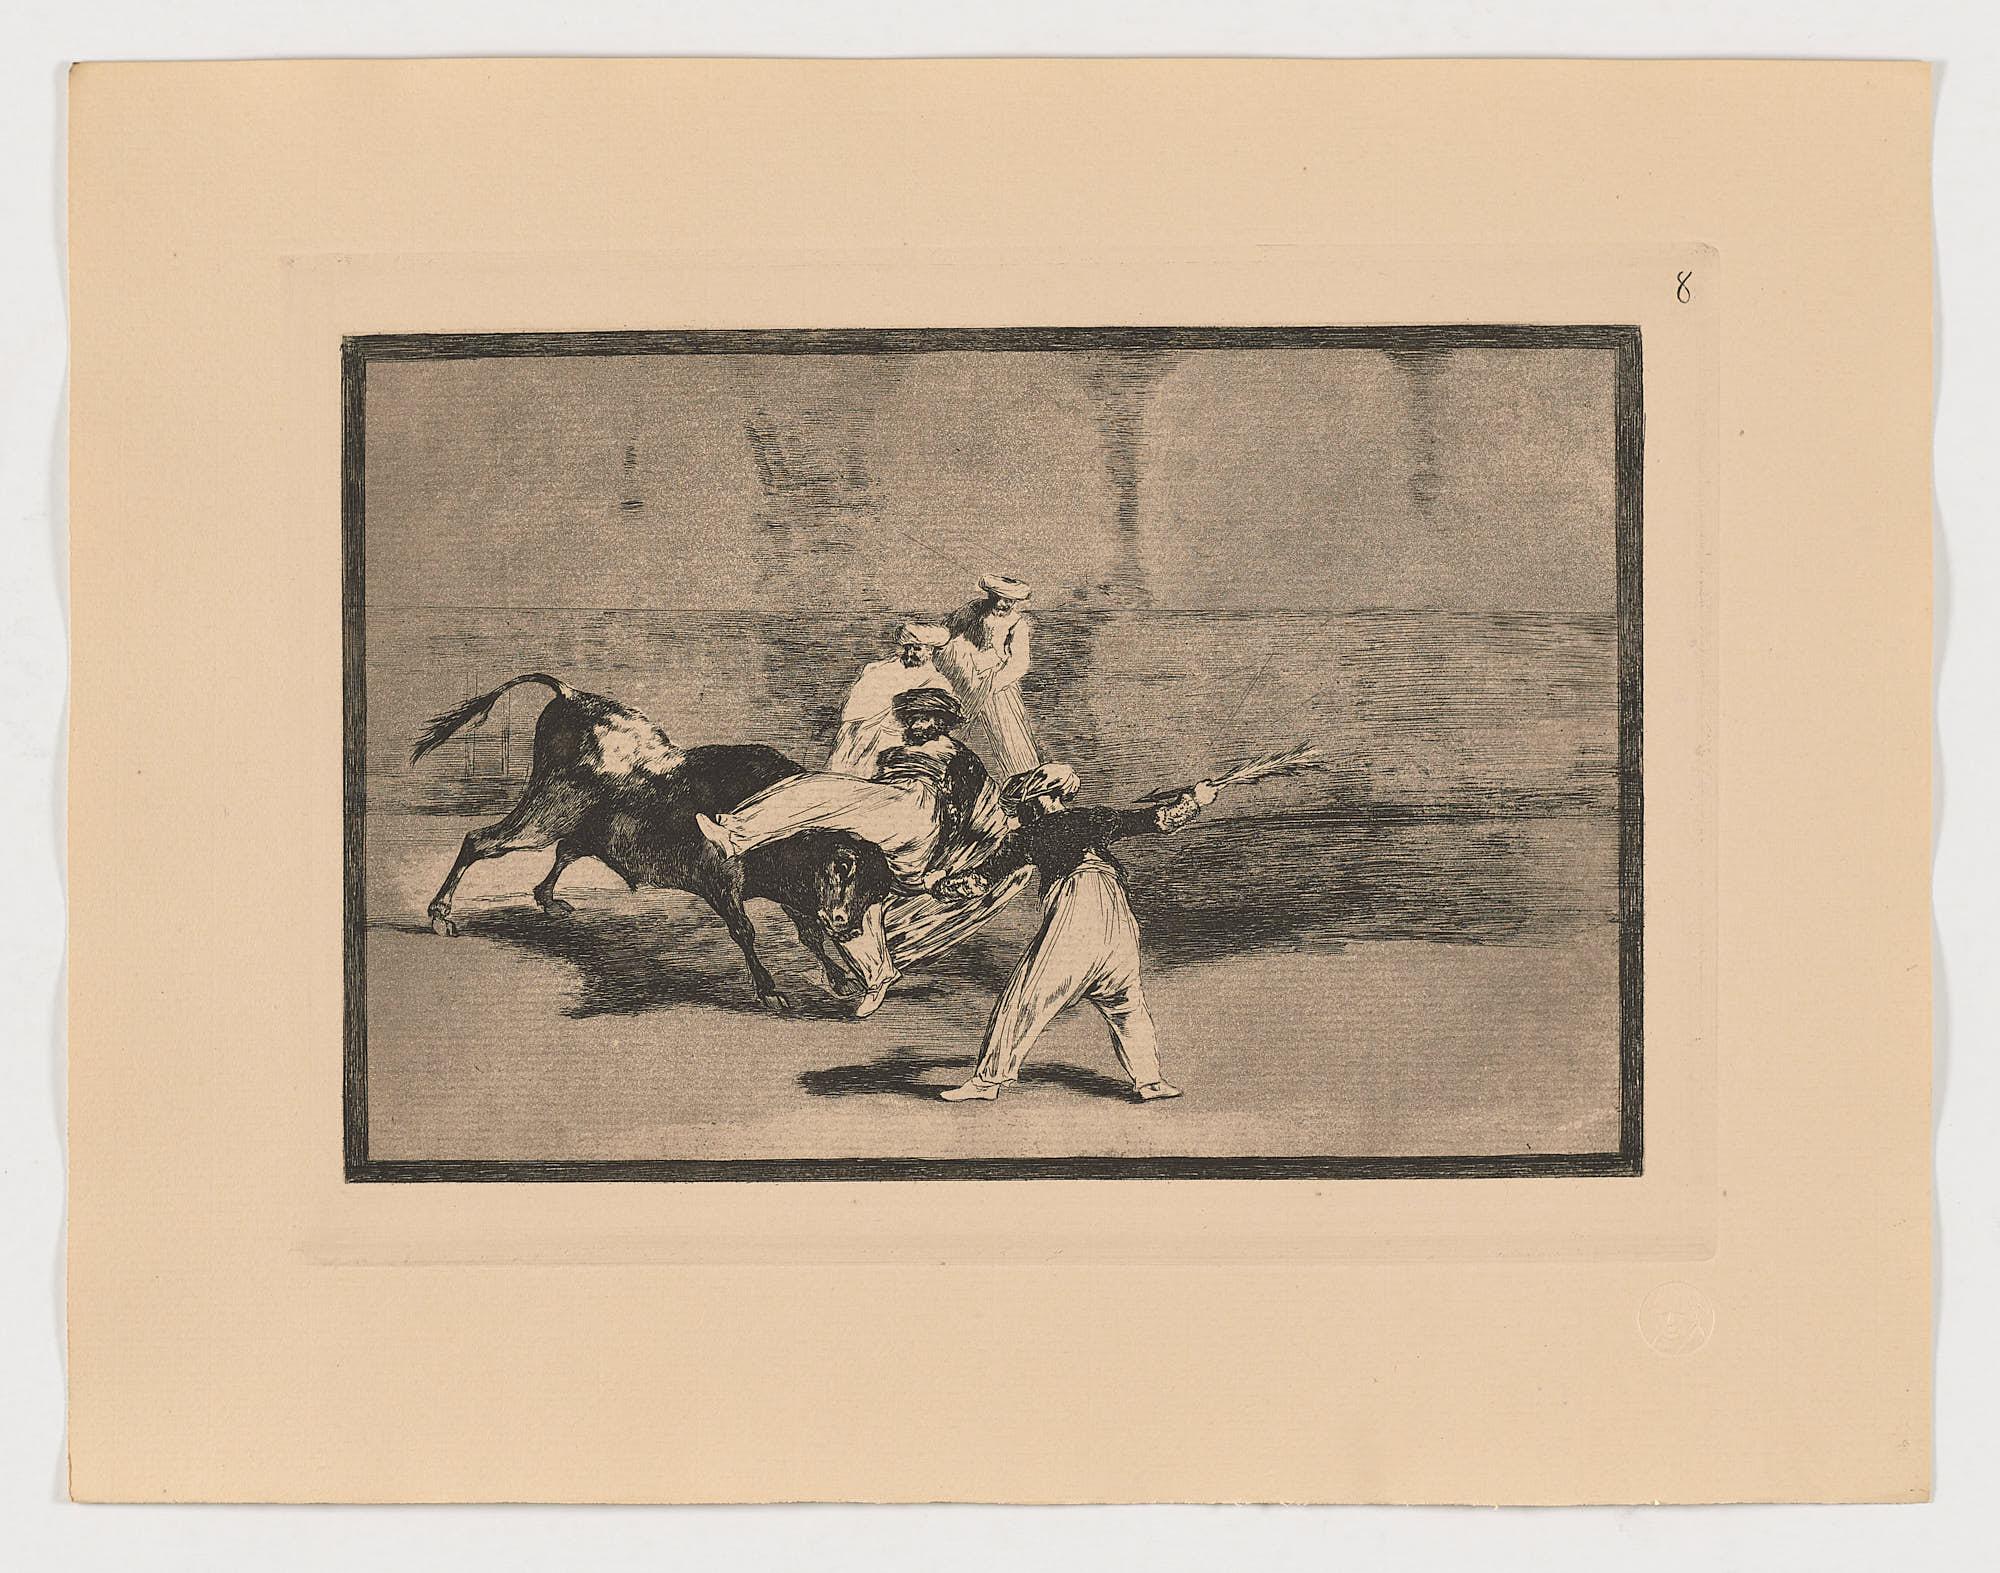 La Tauromaquia (8), Francisco de Goya